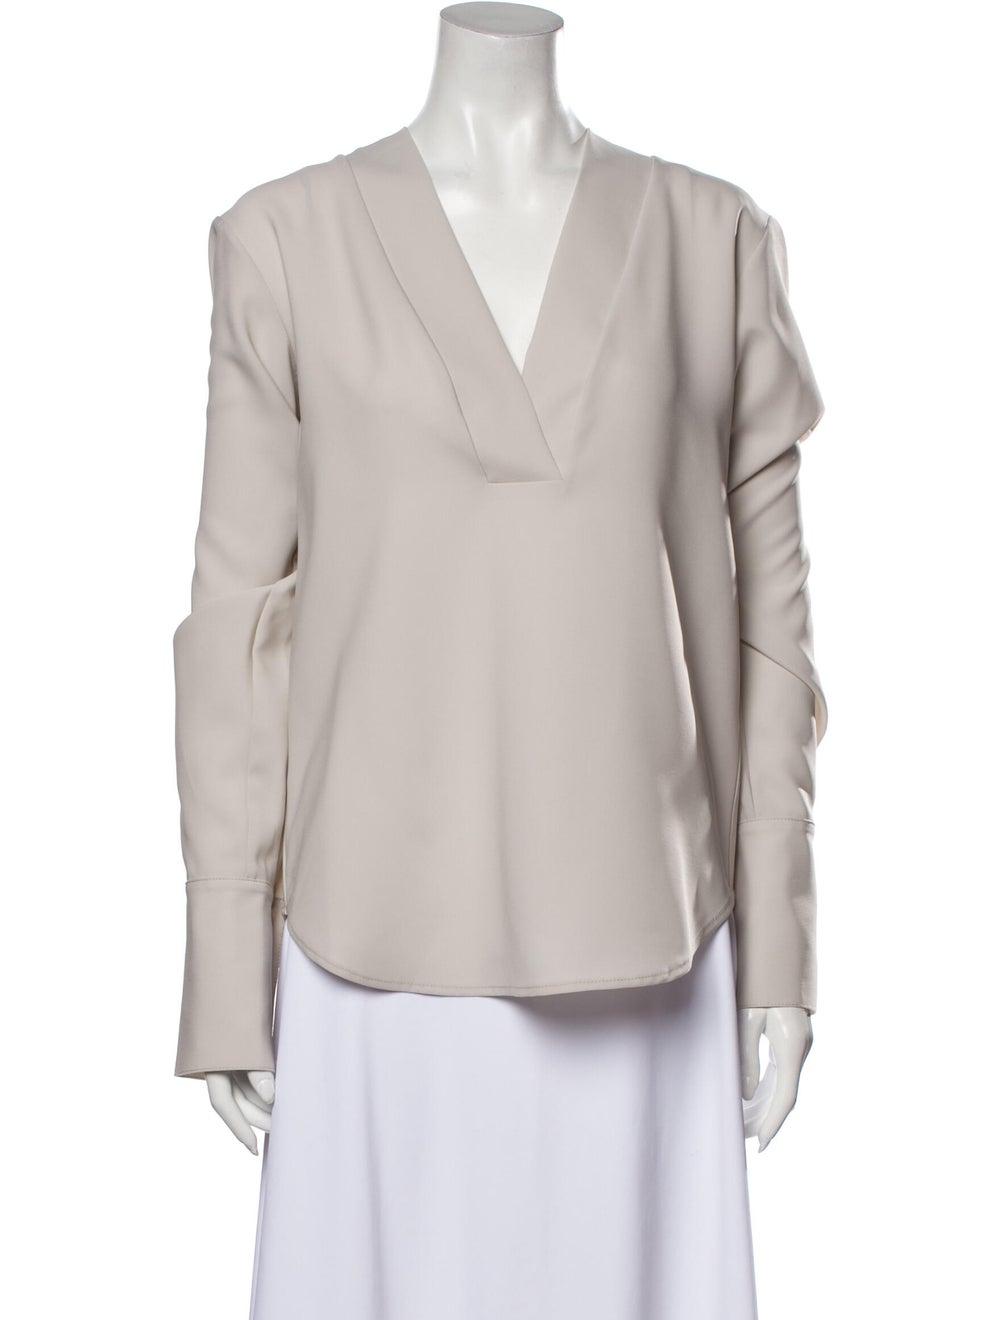 Beaufille V-Neck Long Sleeve Blouse Grey - image 1